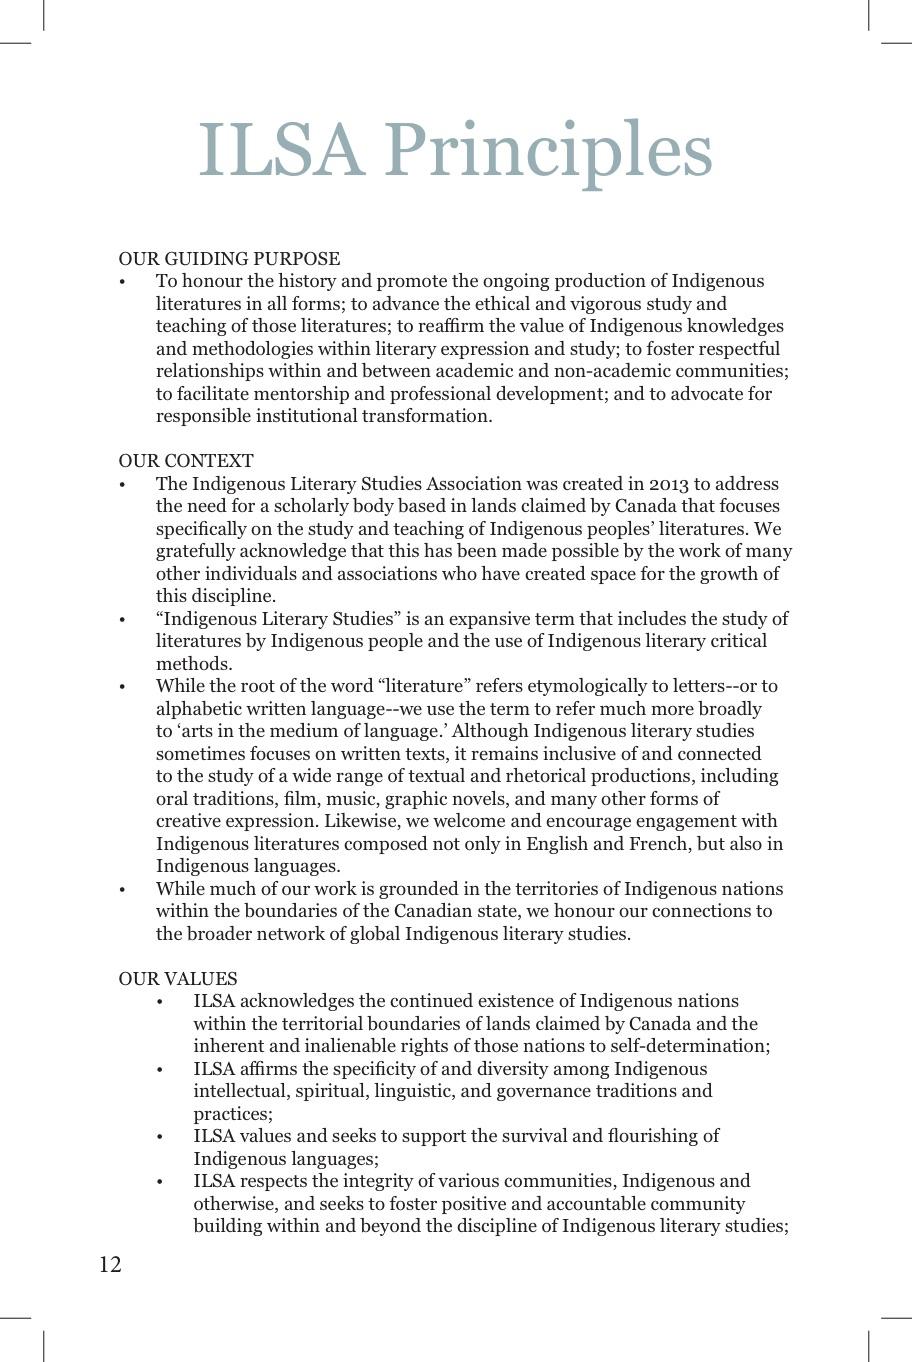 essay on analysis school in english